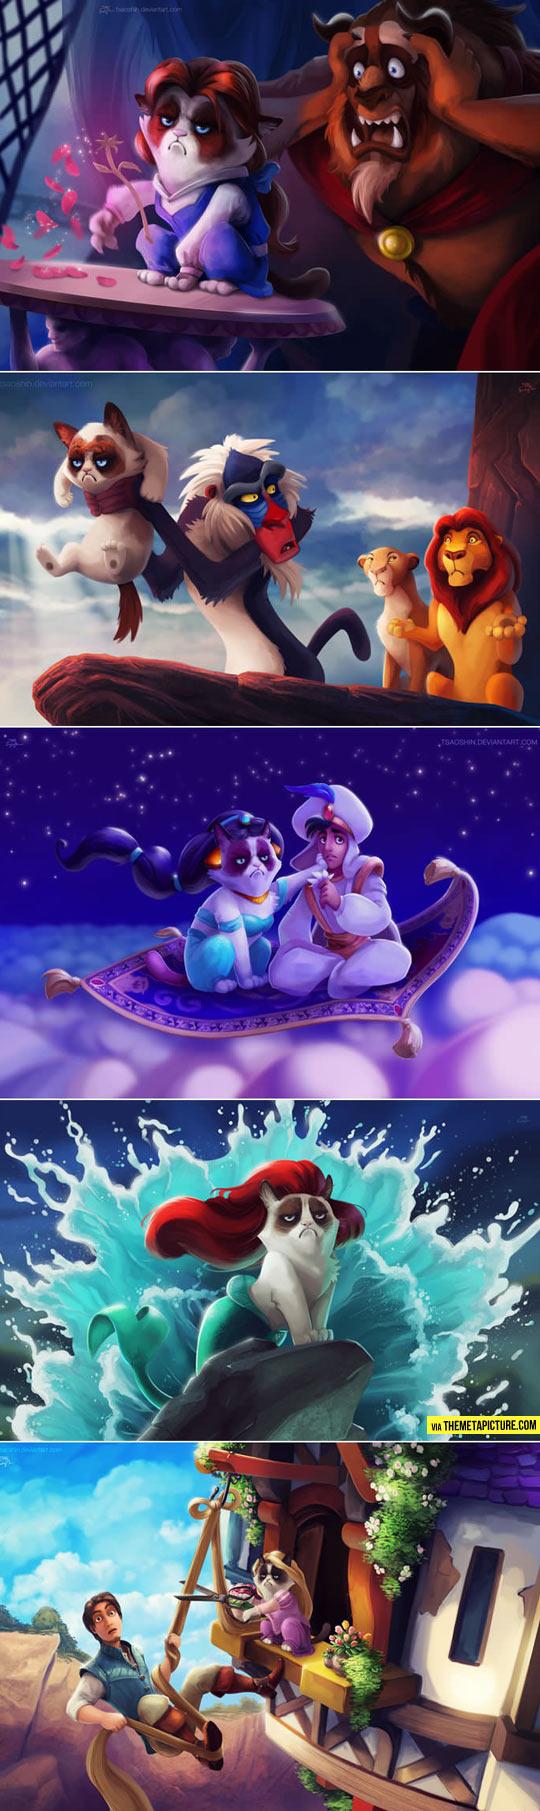 funny-Grumpy-Cat-movies-Disney